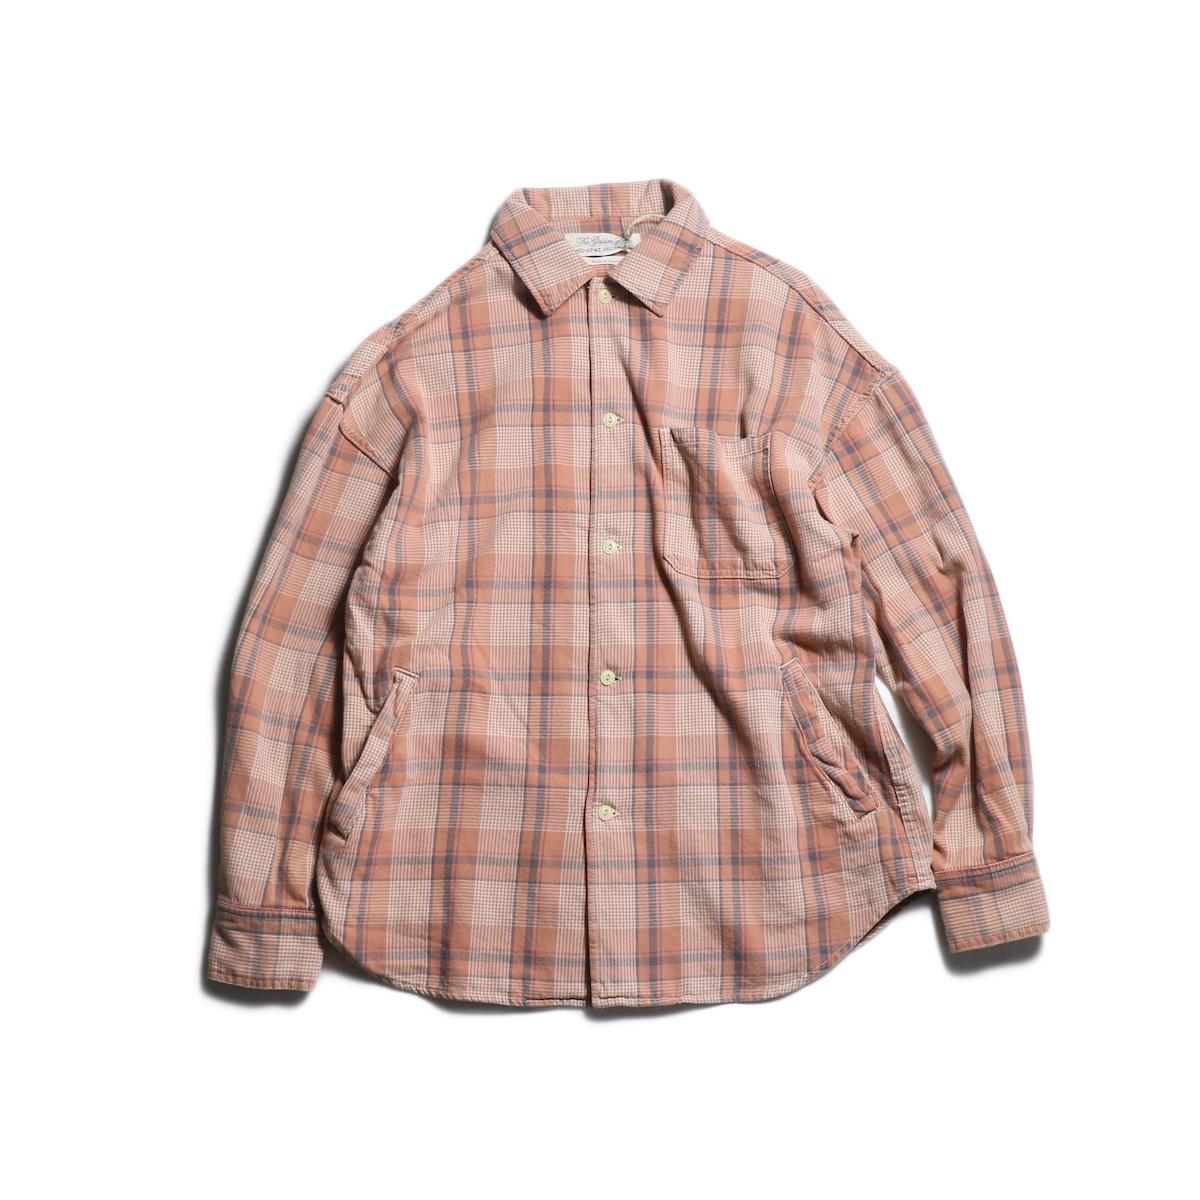 REMI RELIEF / チェックオープンシャツ (Orange)